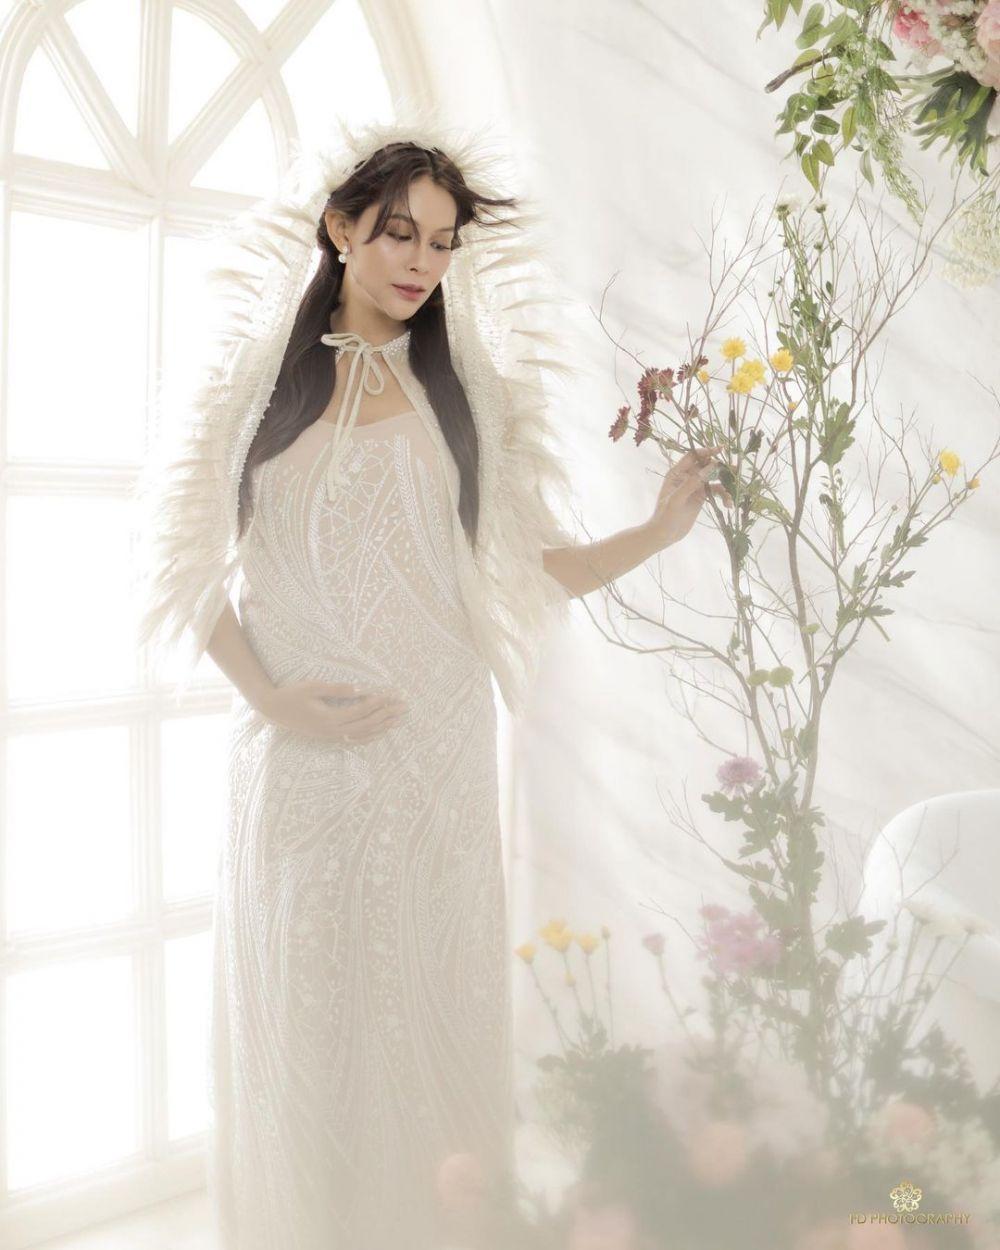 maternity terbaru bunga jelitha © Instagram